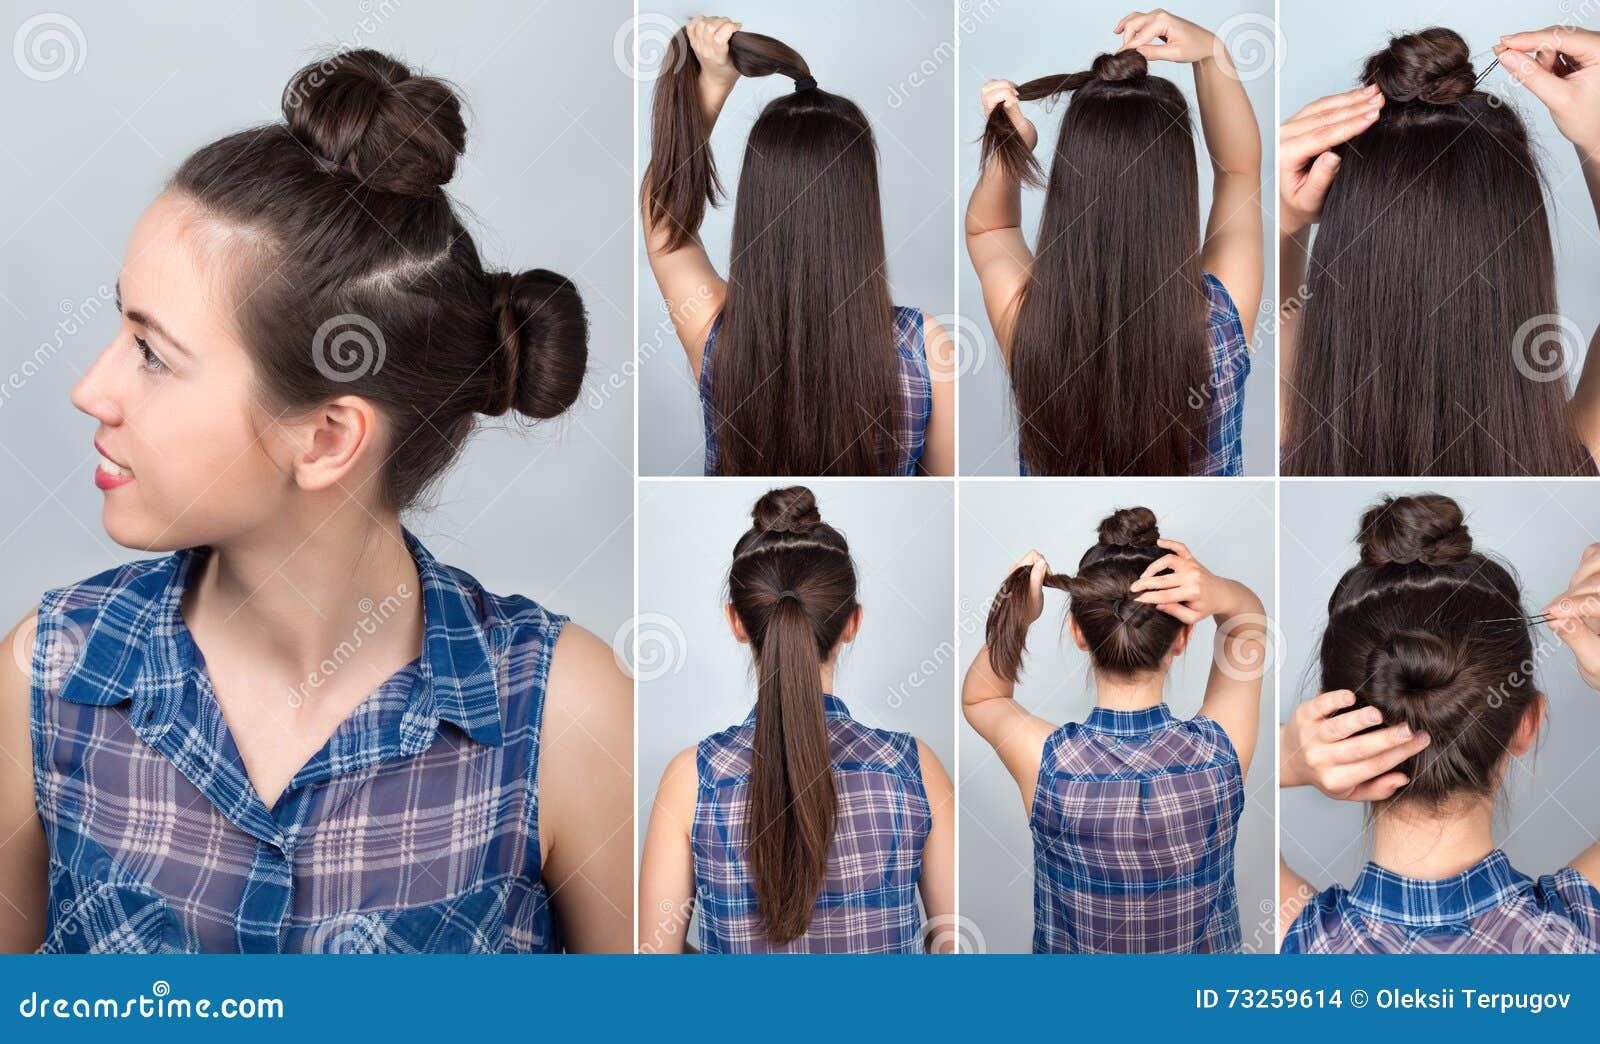 Hairstyle two bun tutorial stock photo. Image of easy - 73259614